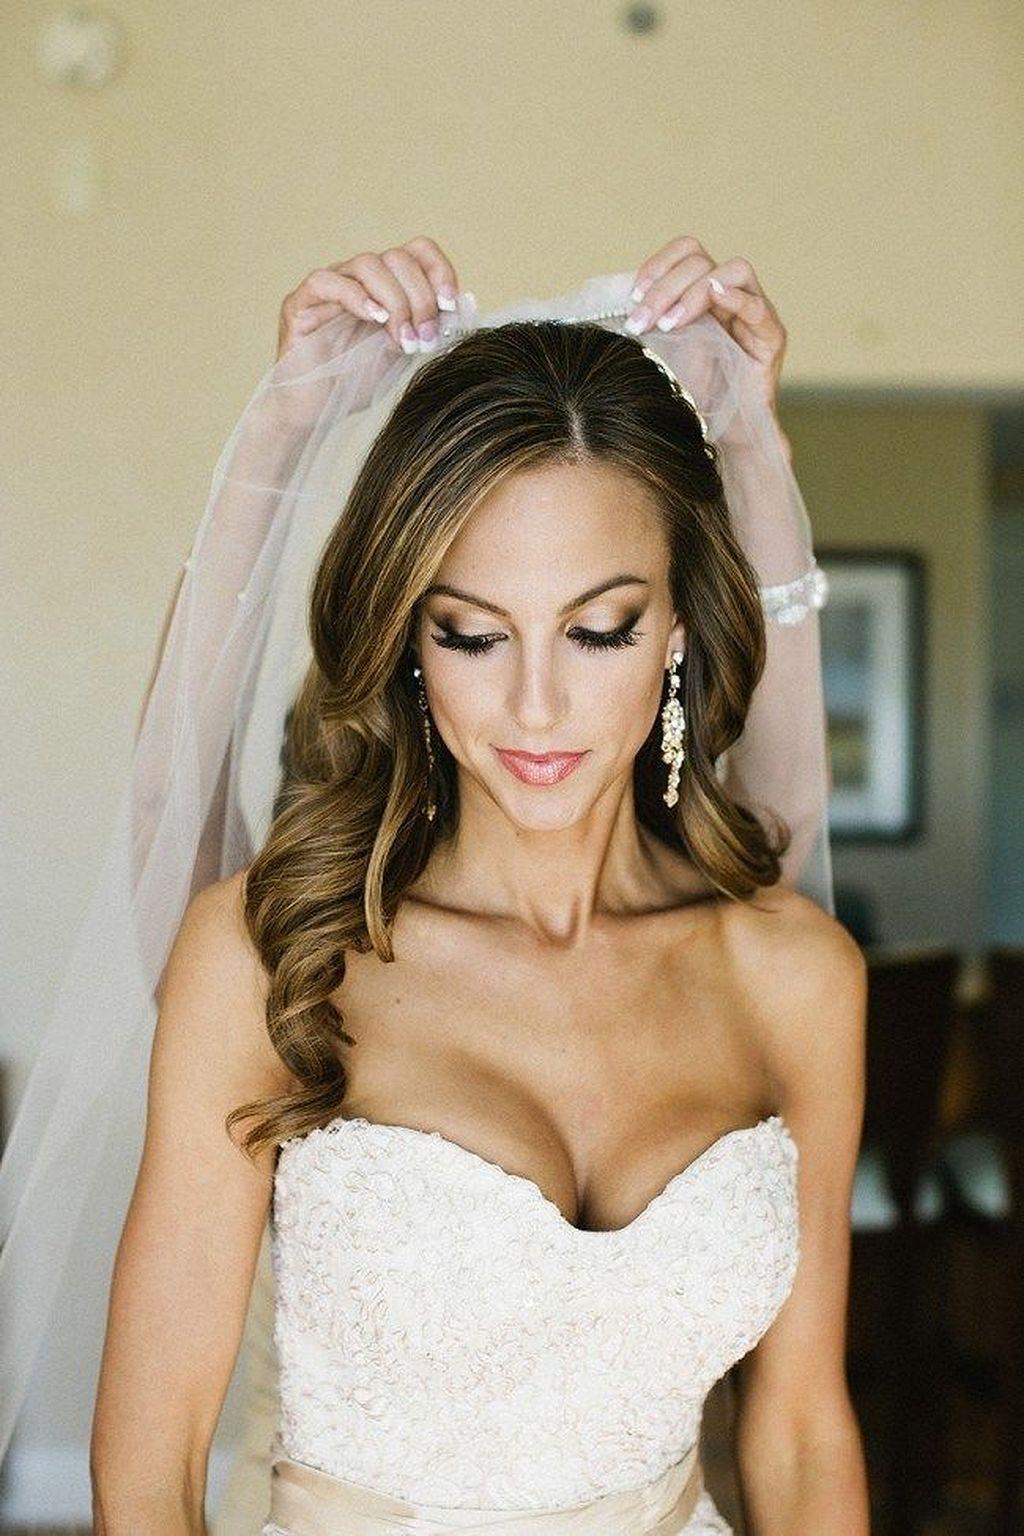 Wedding Hairstyles Down Endearing 40 Wedding Hair Down With Veil Ideas  Veil Weddings And Wedding